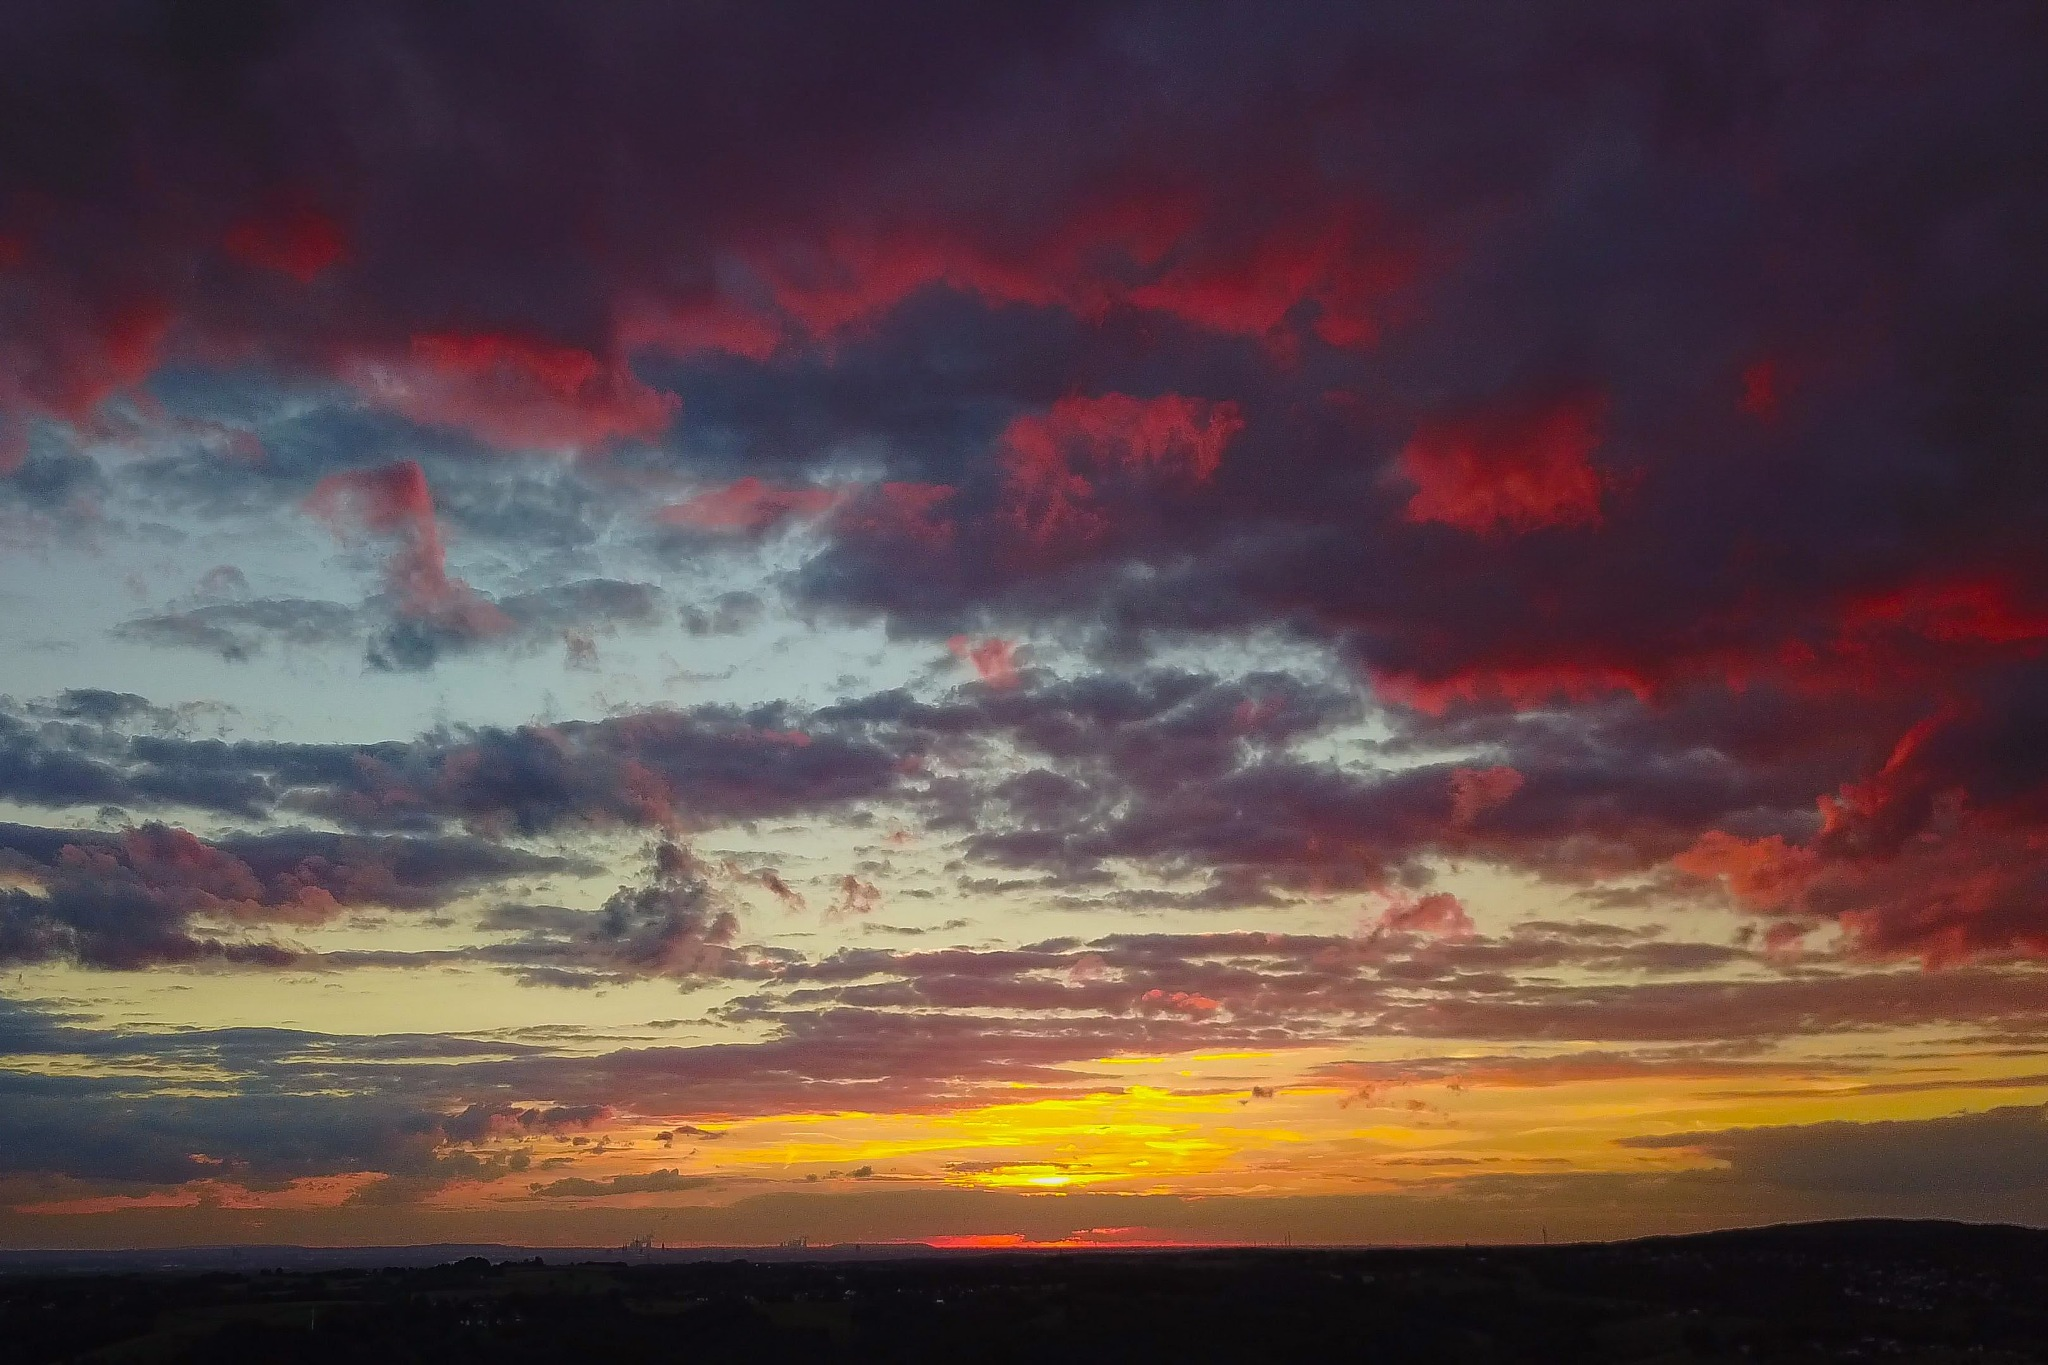 Sunset colors by Sergej Pril